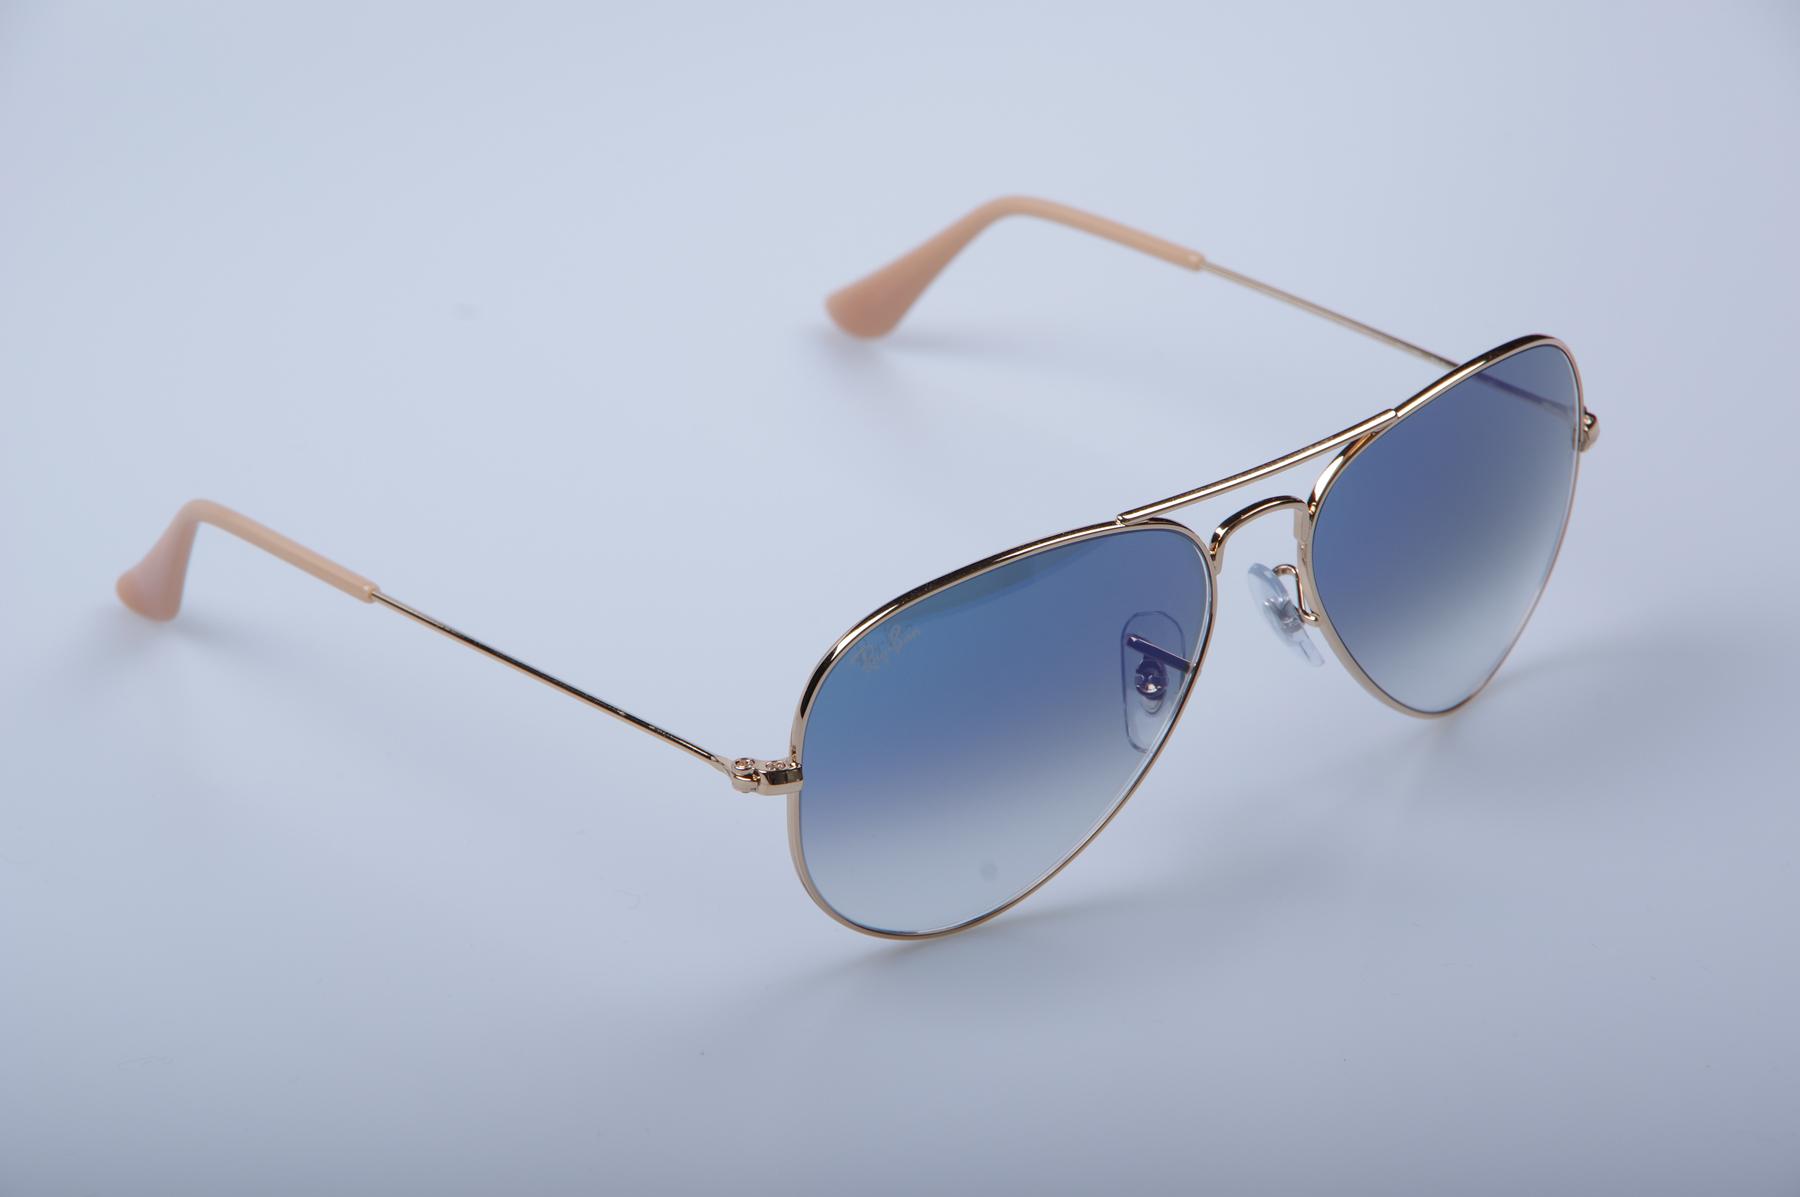 lunette ray ban aviator a vendre